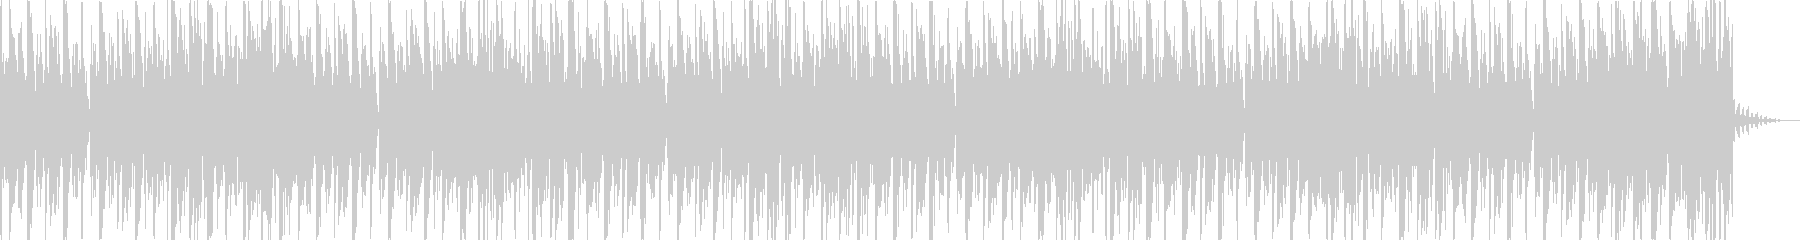 EDMドロップオンリー 05の未再生の波形